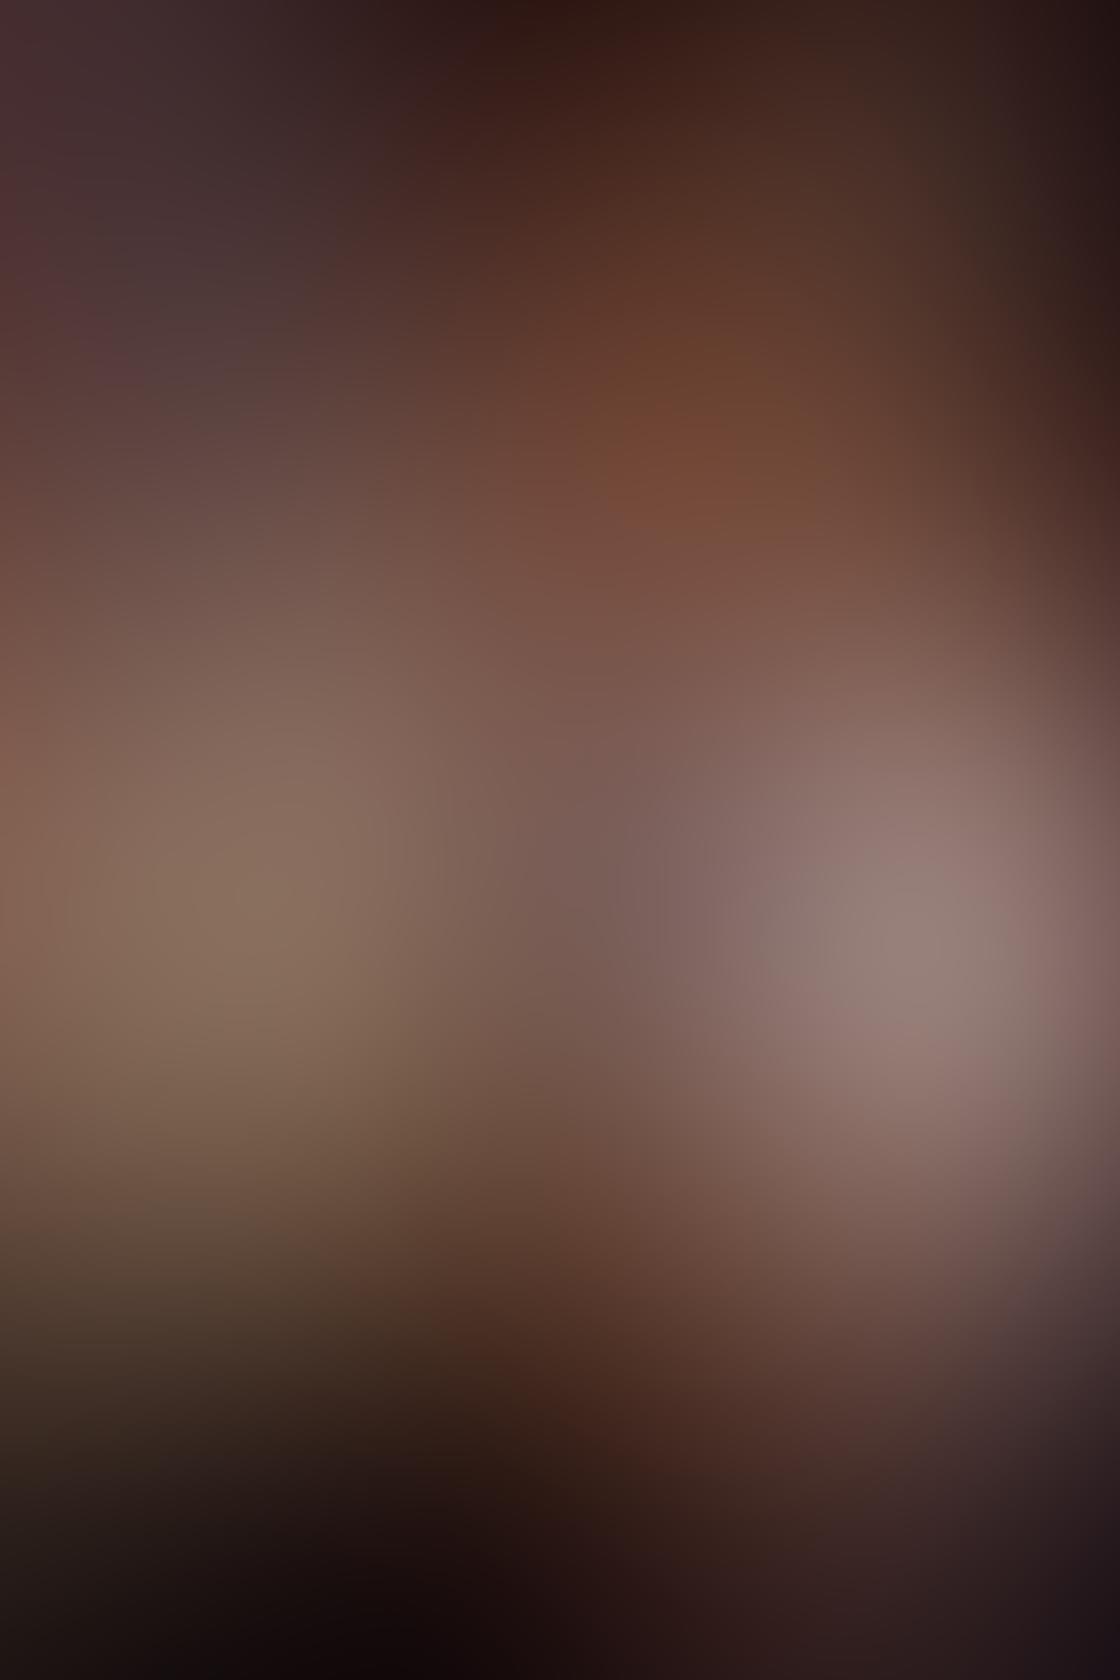 Edit SLR Photos On iPhone 14